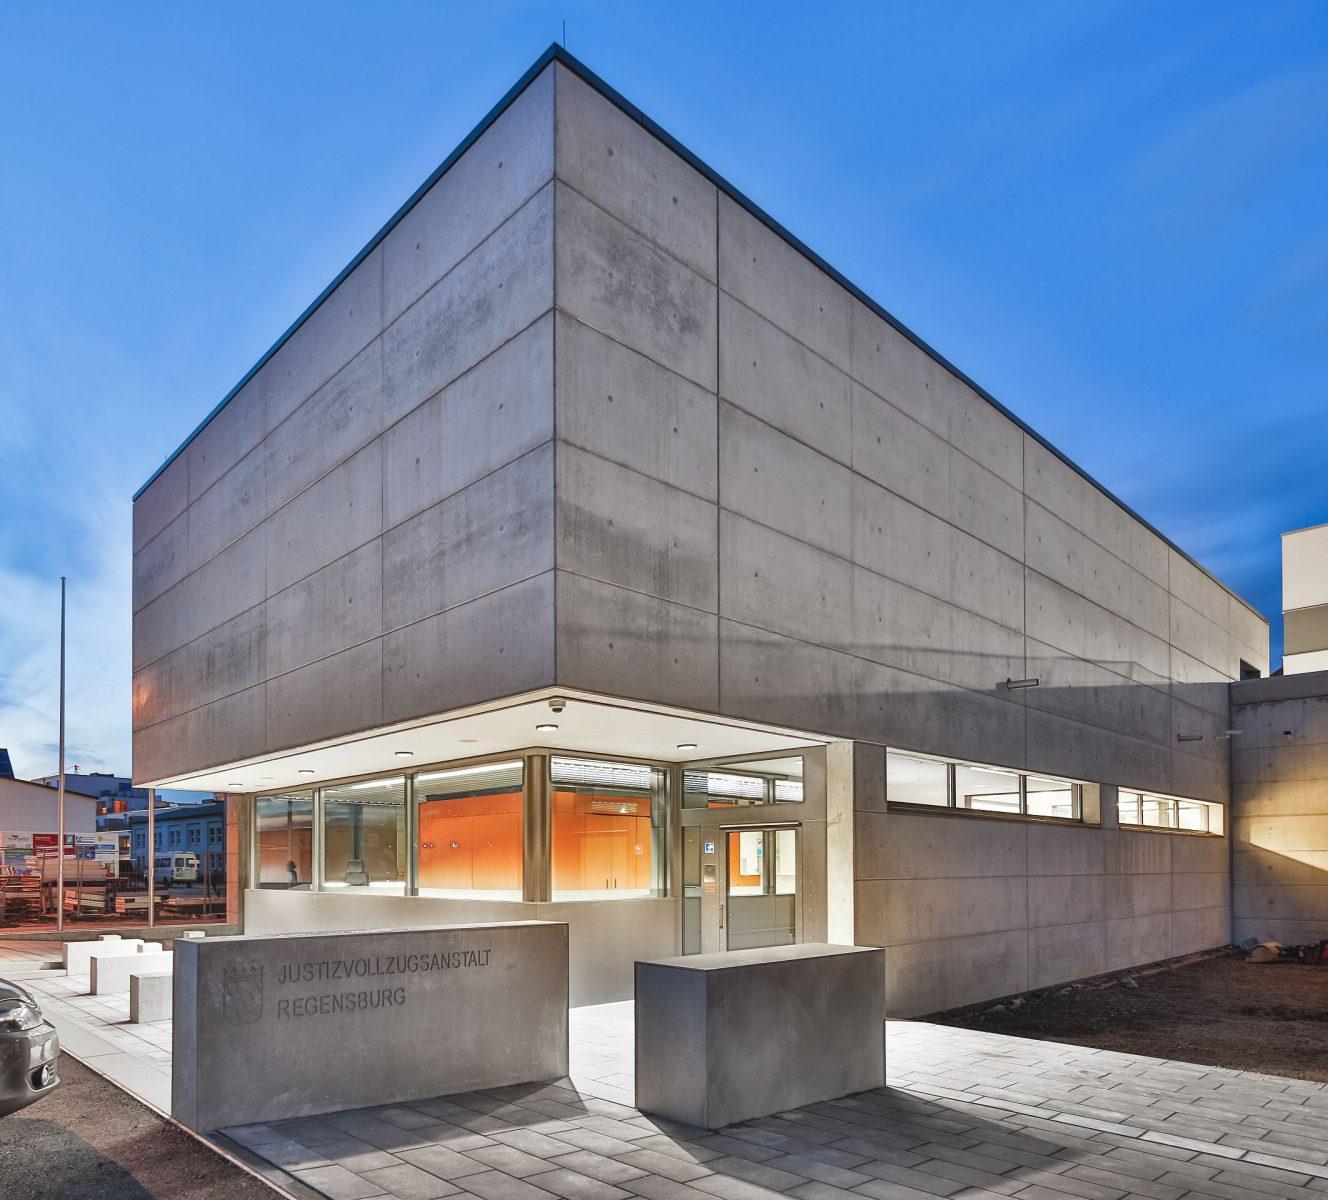 Justizvollzugsanstalt Regensburg, Neubau Torwachgebäude